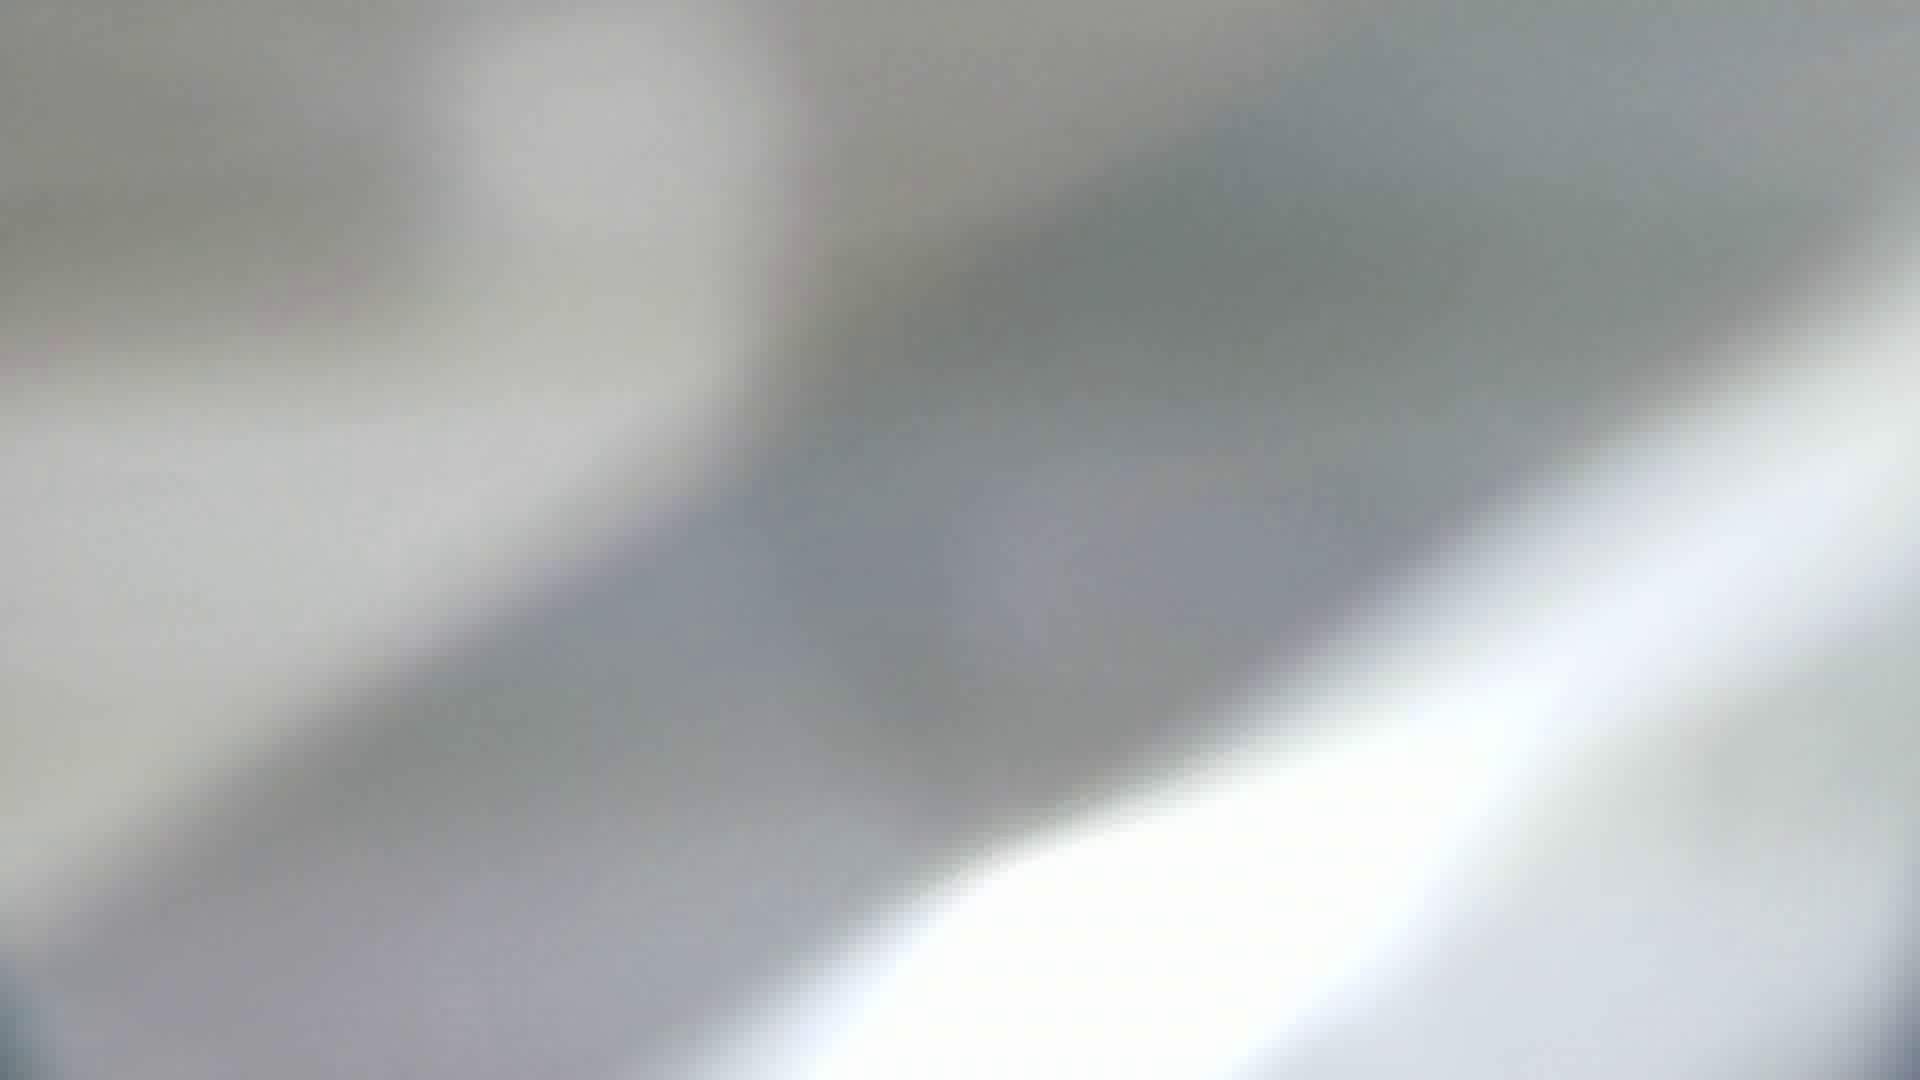 vol.25三十時間潜り、一つしか出会えない完璧桃尻編 byお銀 洗面所 のぞき動画キャプチャ 96連発 11